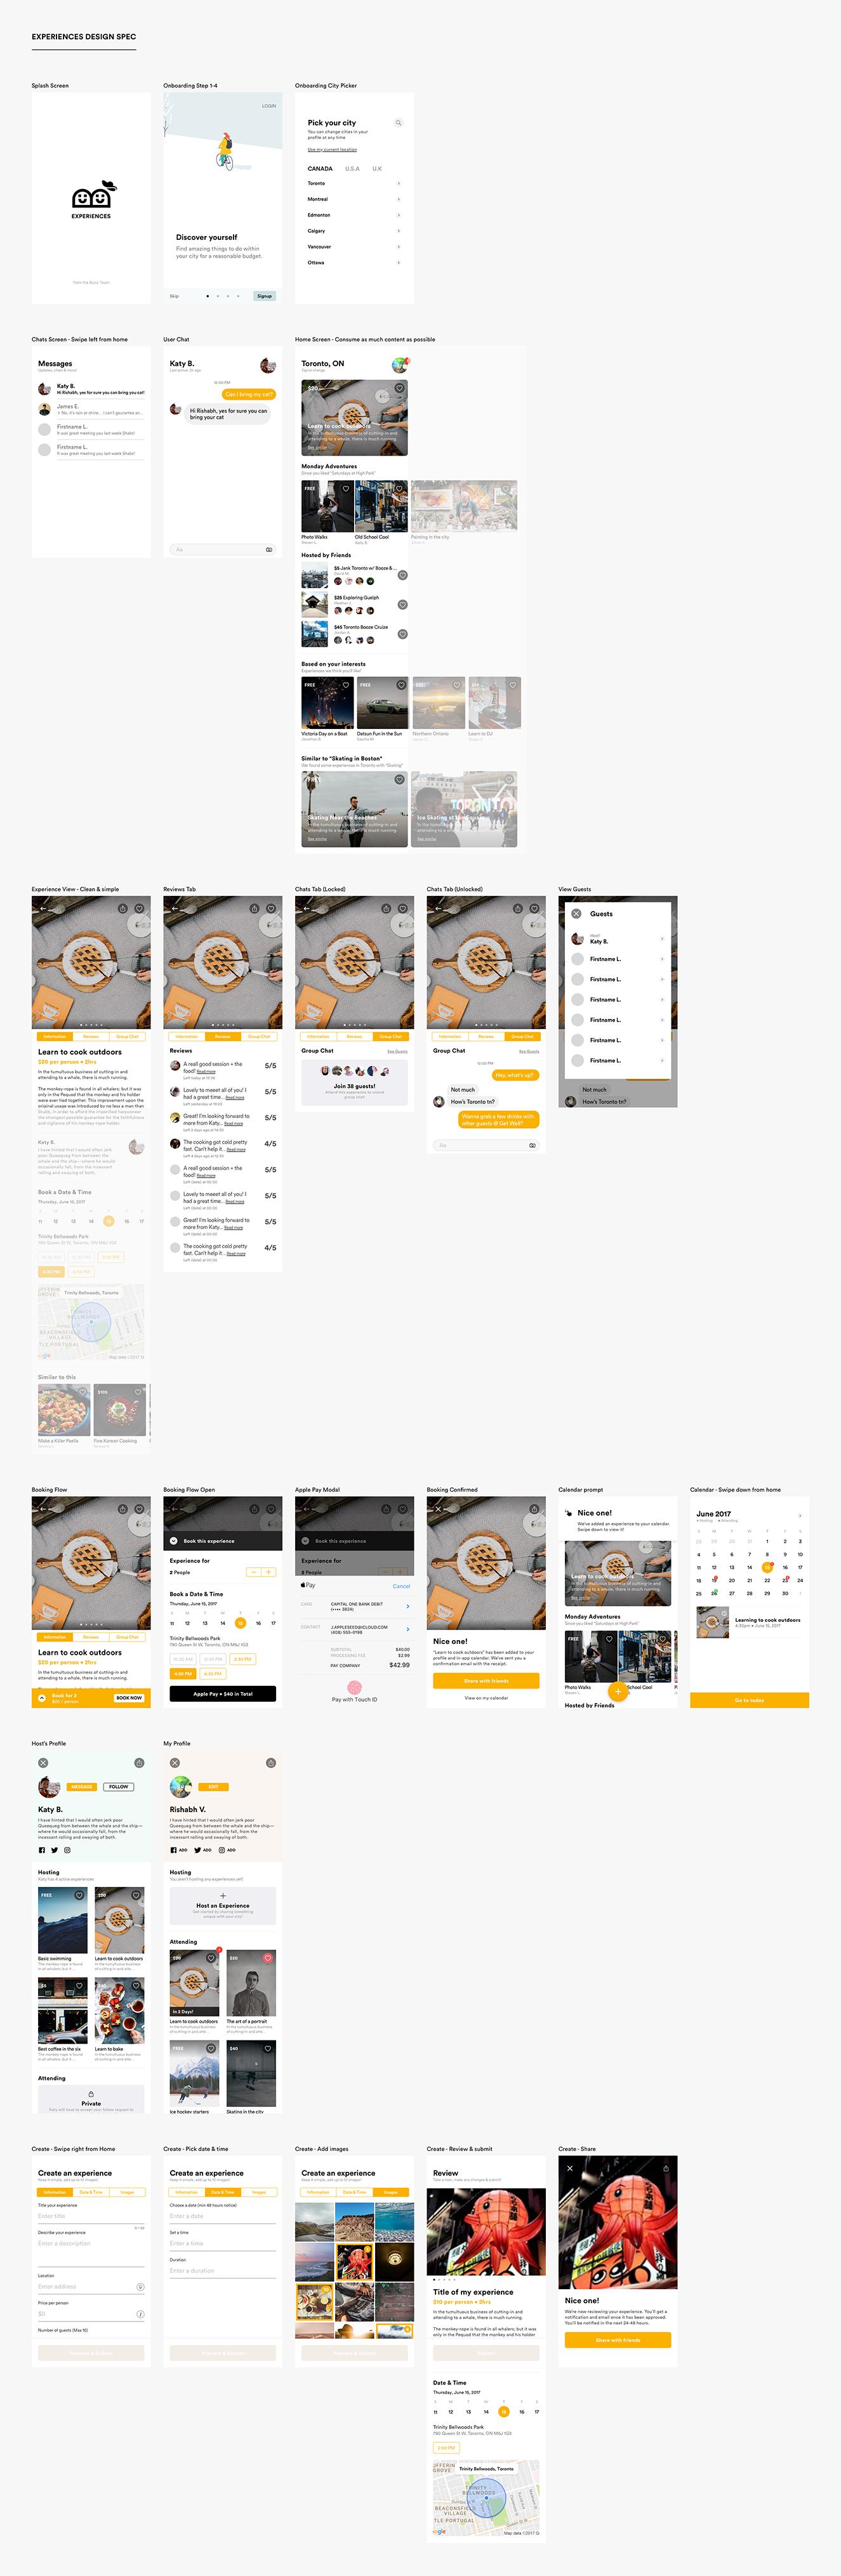 Experiences Design Language and Screens